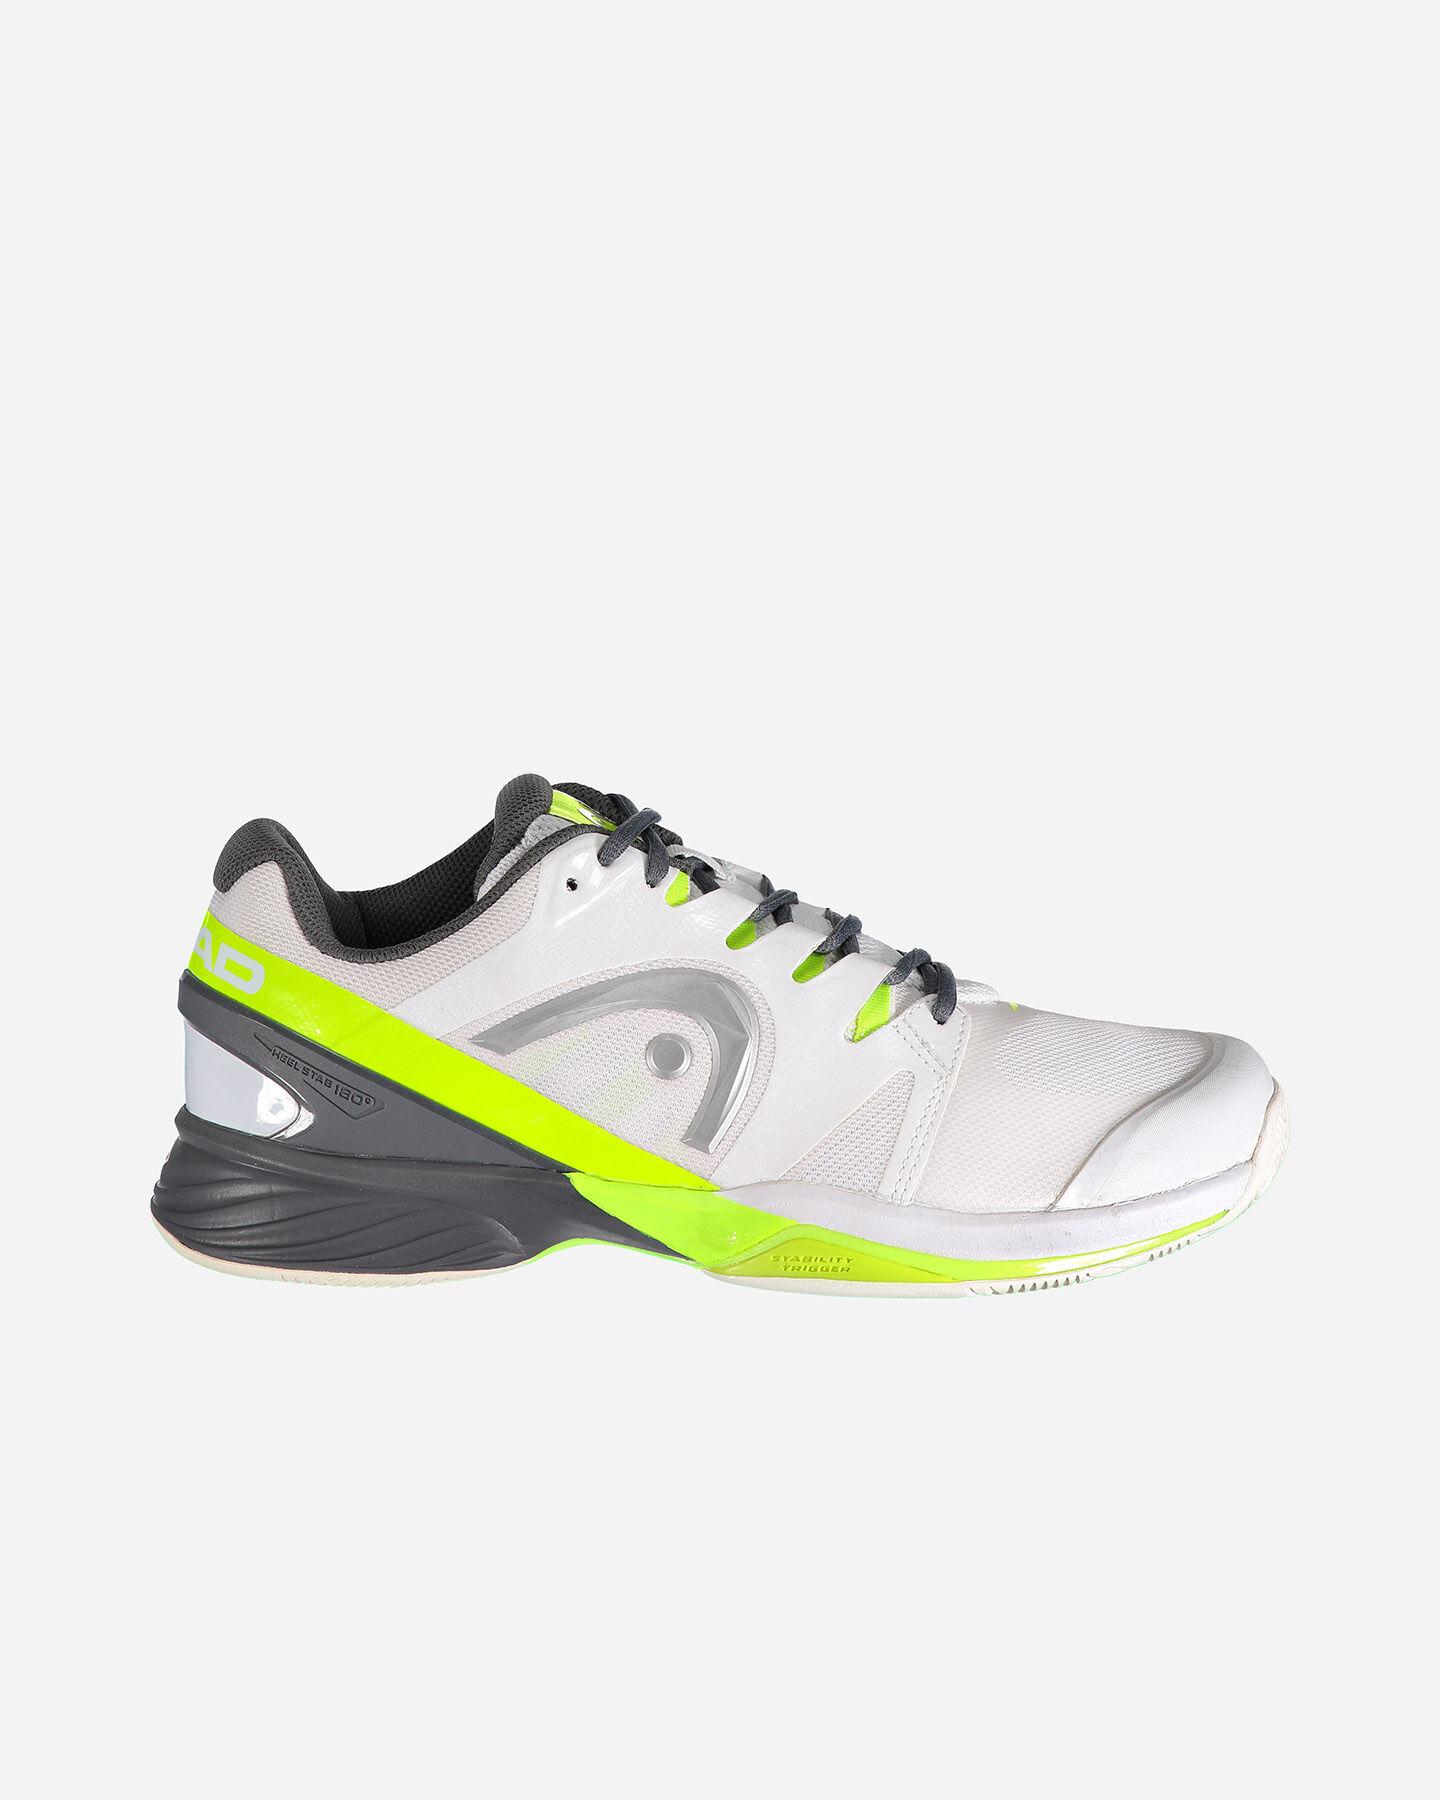 273056 Whny Sport Clay Scarpe Tennis Nitro M Su Pro Head Cisalfa 7qwx7Y5r